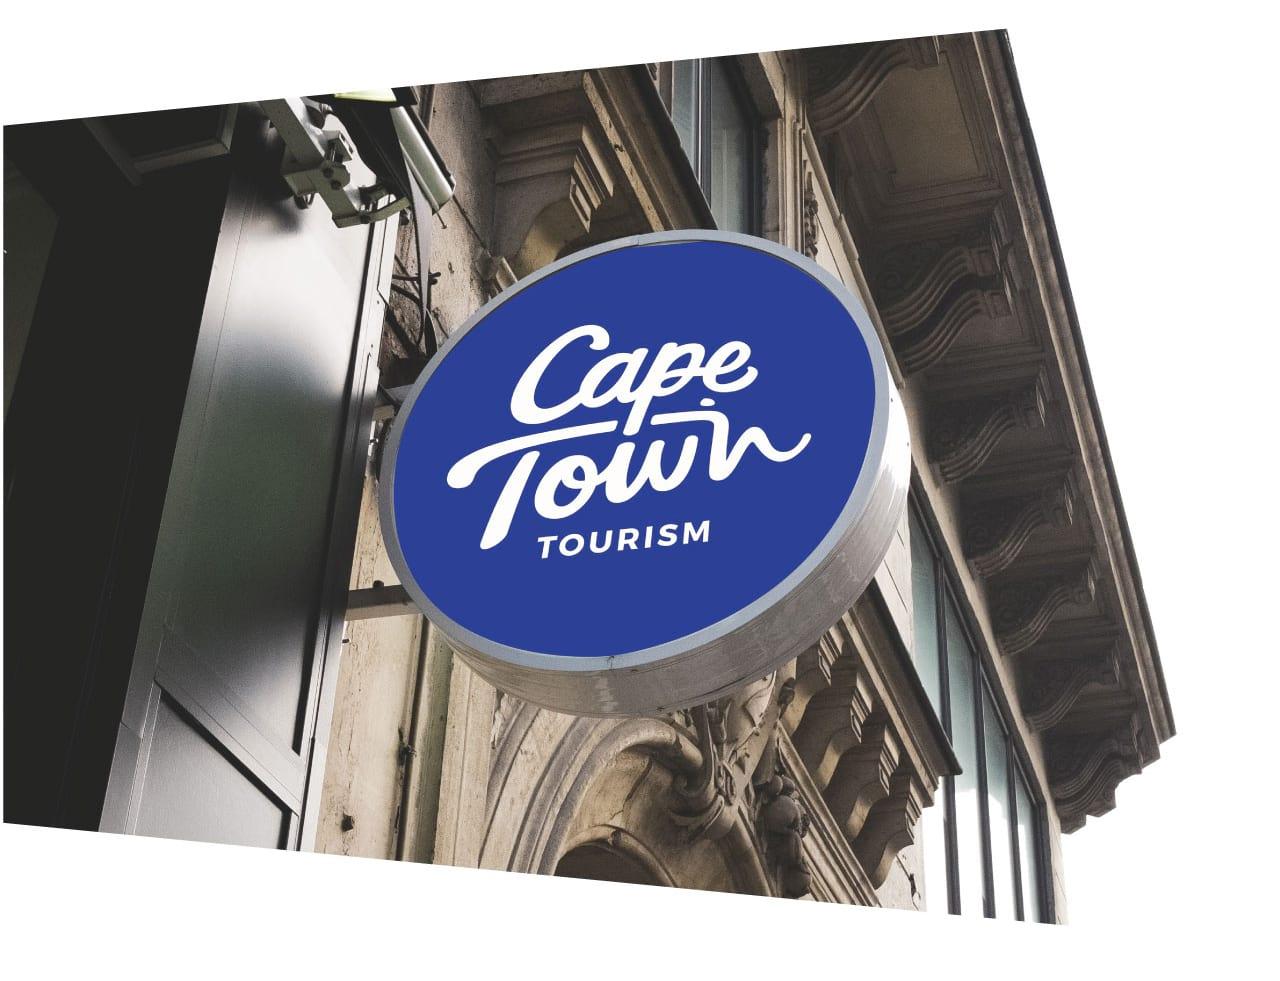 Cape Town Tourism brand Case study signage